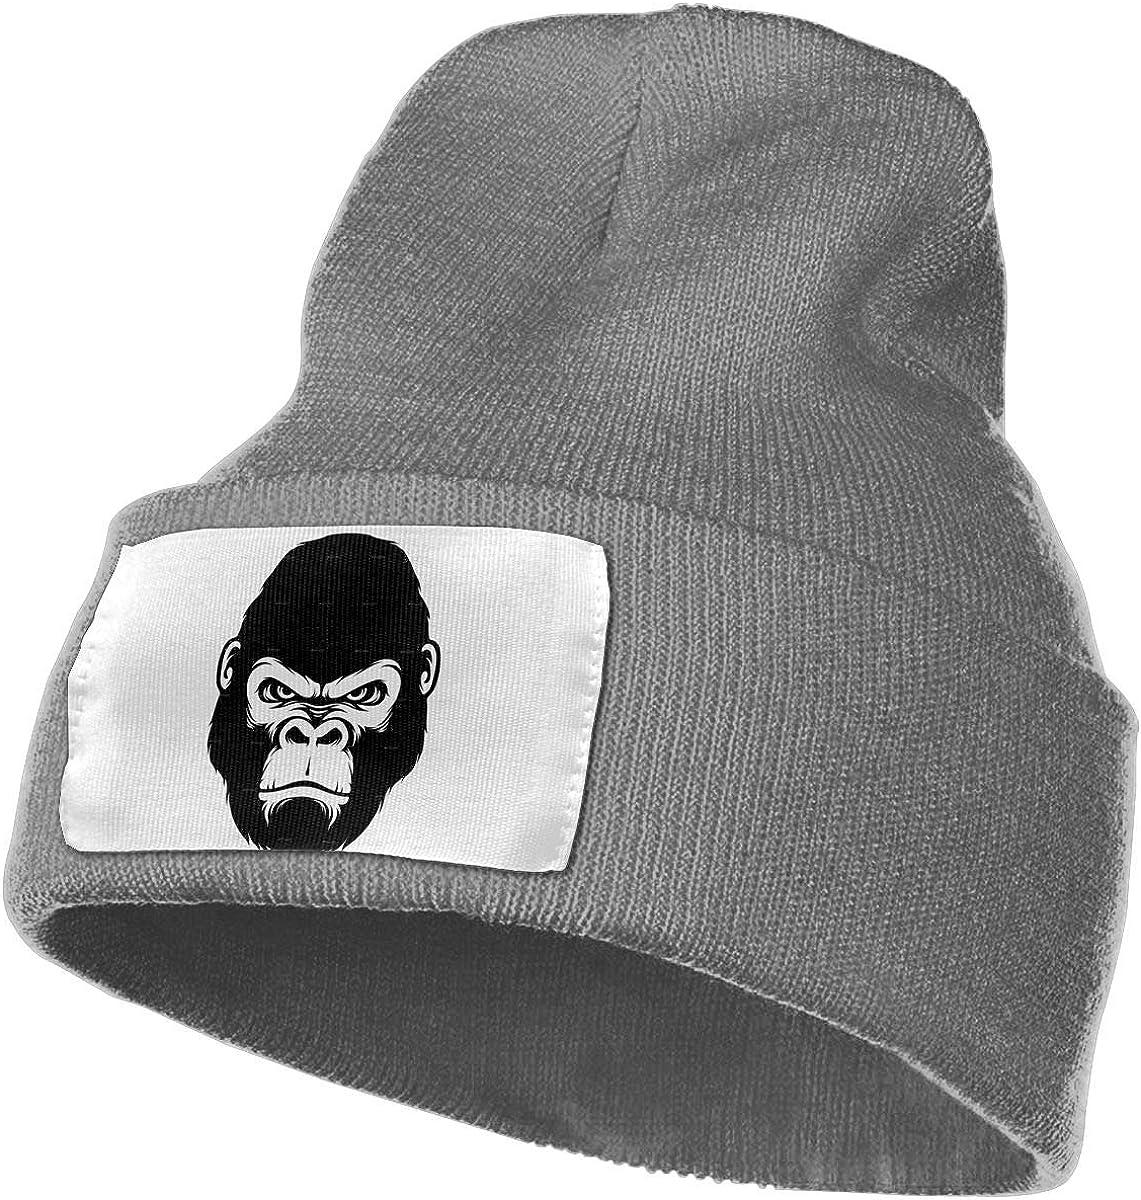 Cool Gorilla Unisex Fashion Knitted Hat Luxury Hip-Hop Cap